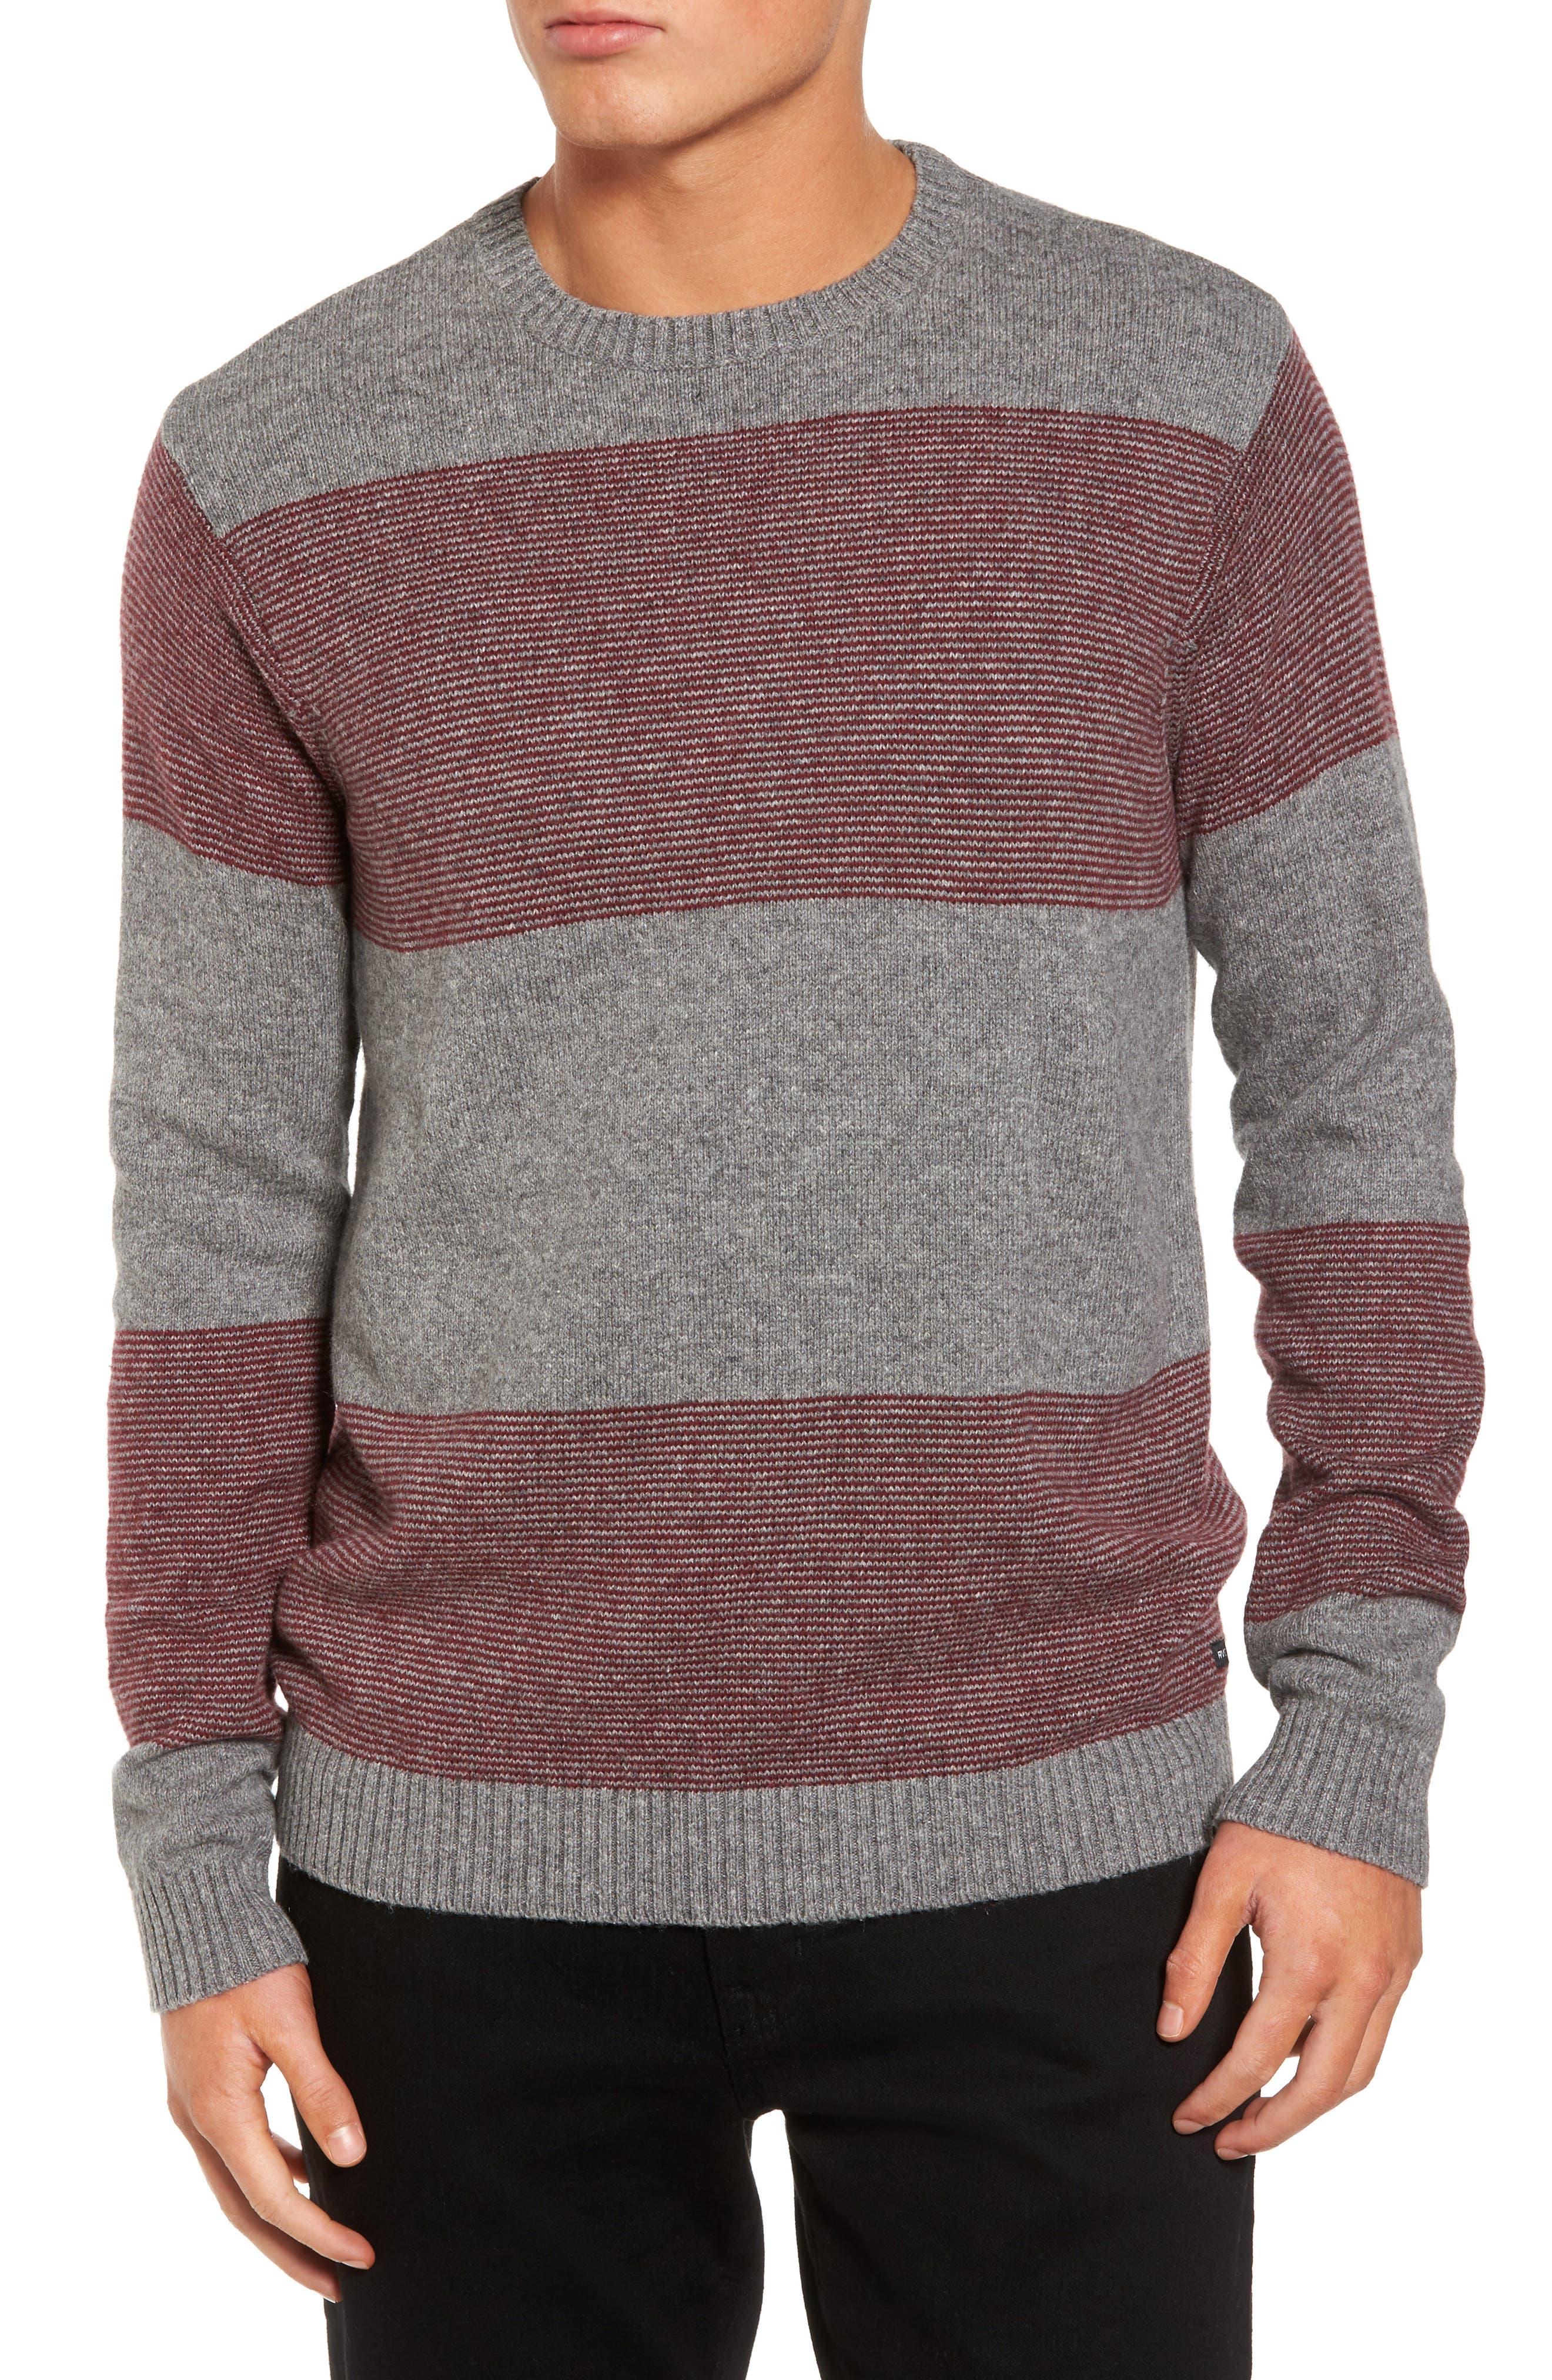 Main Image - RVCA Channels Crewneck Sweater